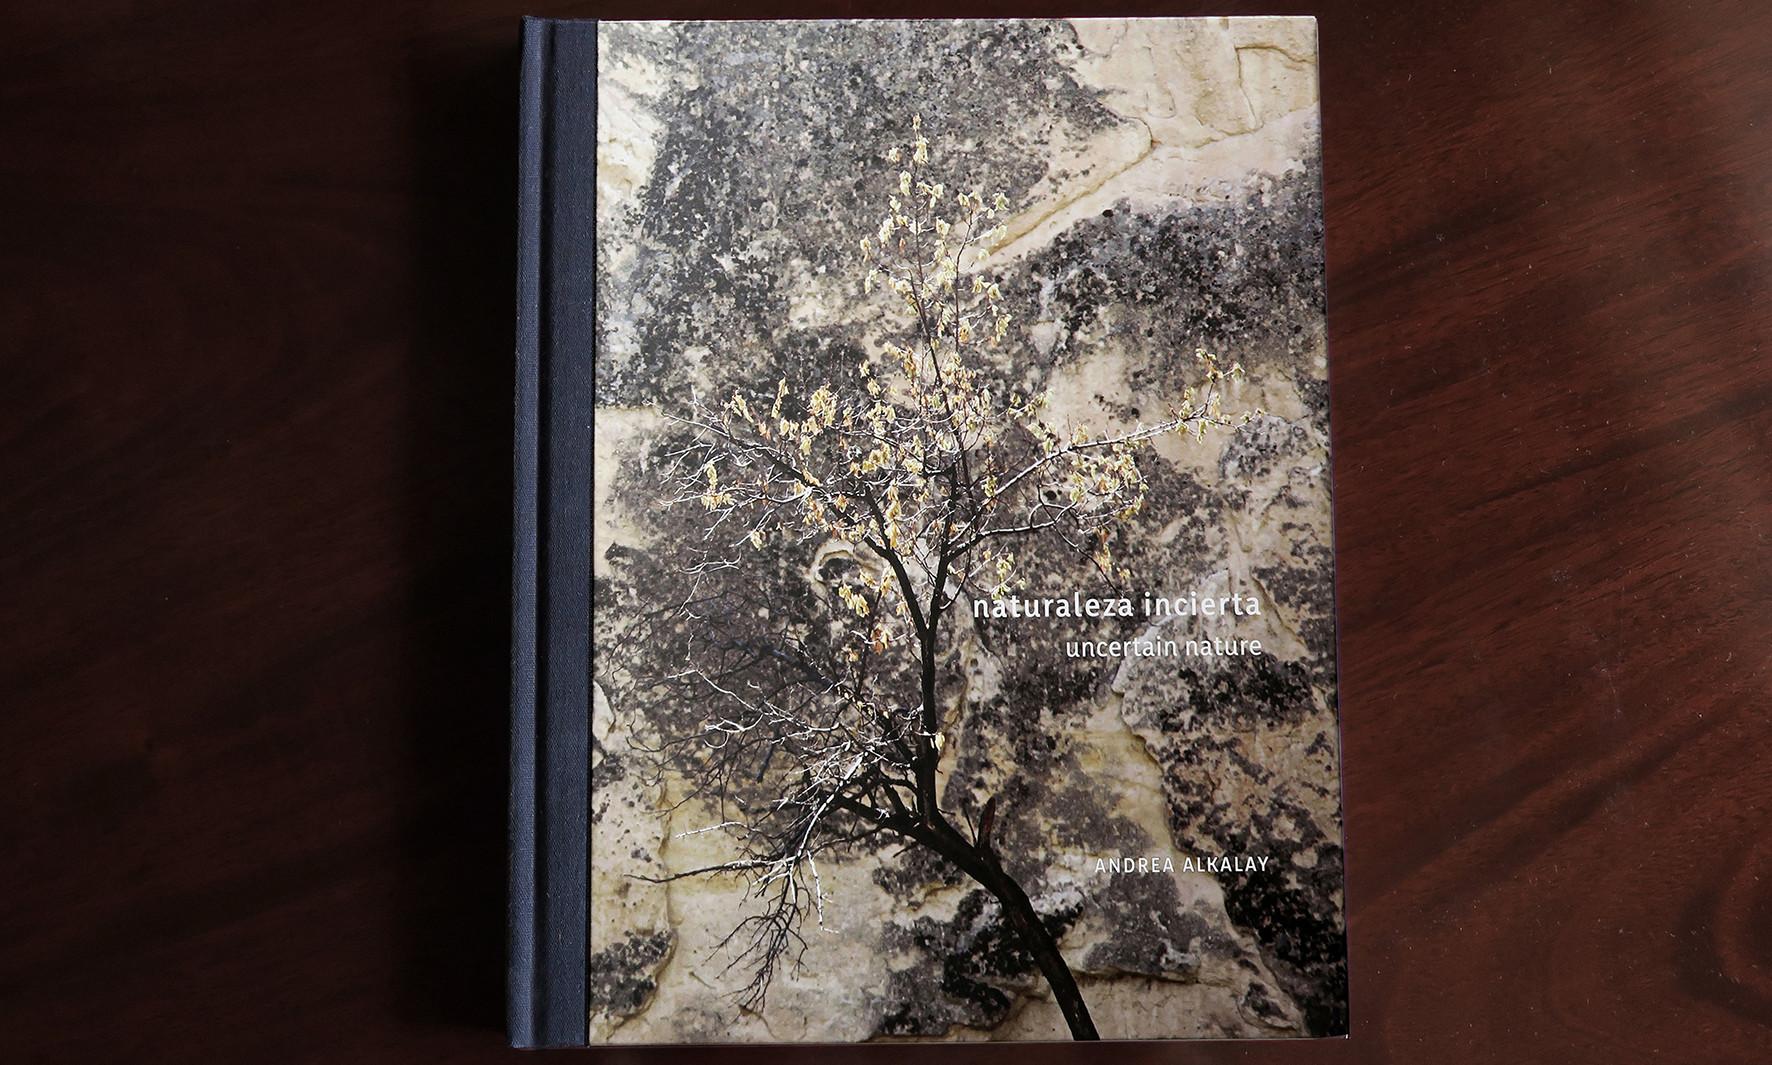 uncertain nature photo book